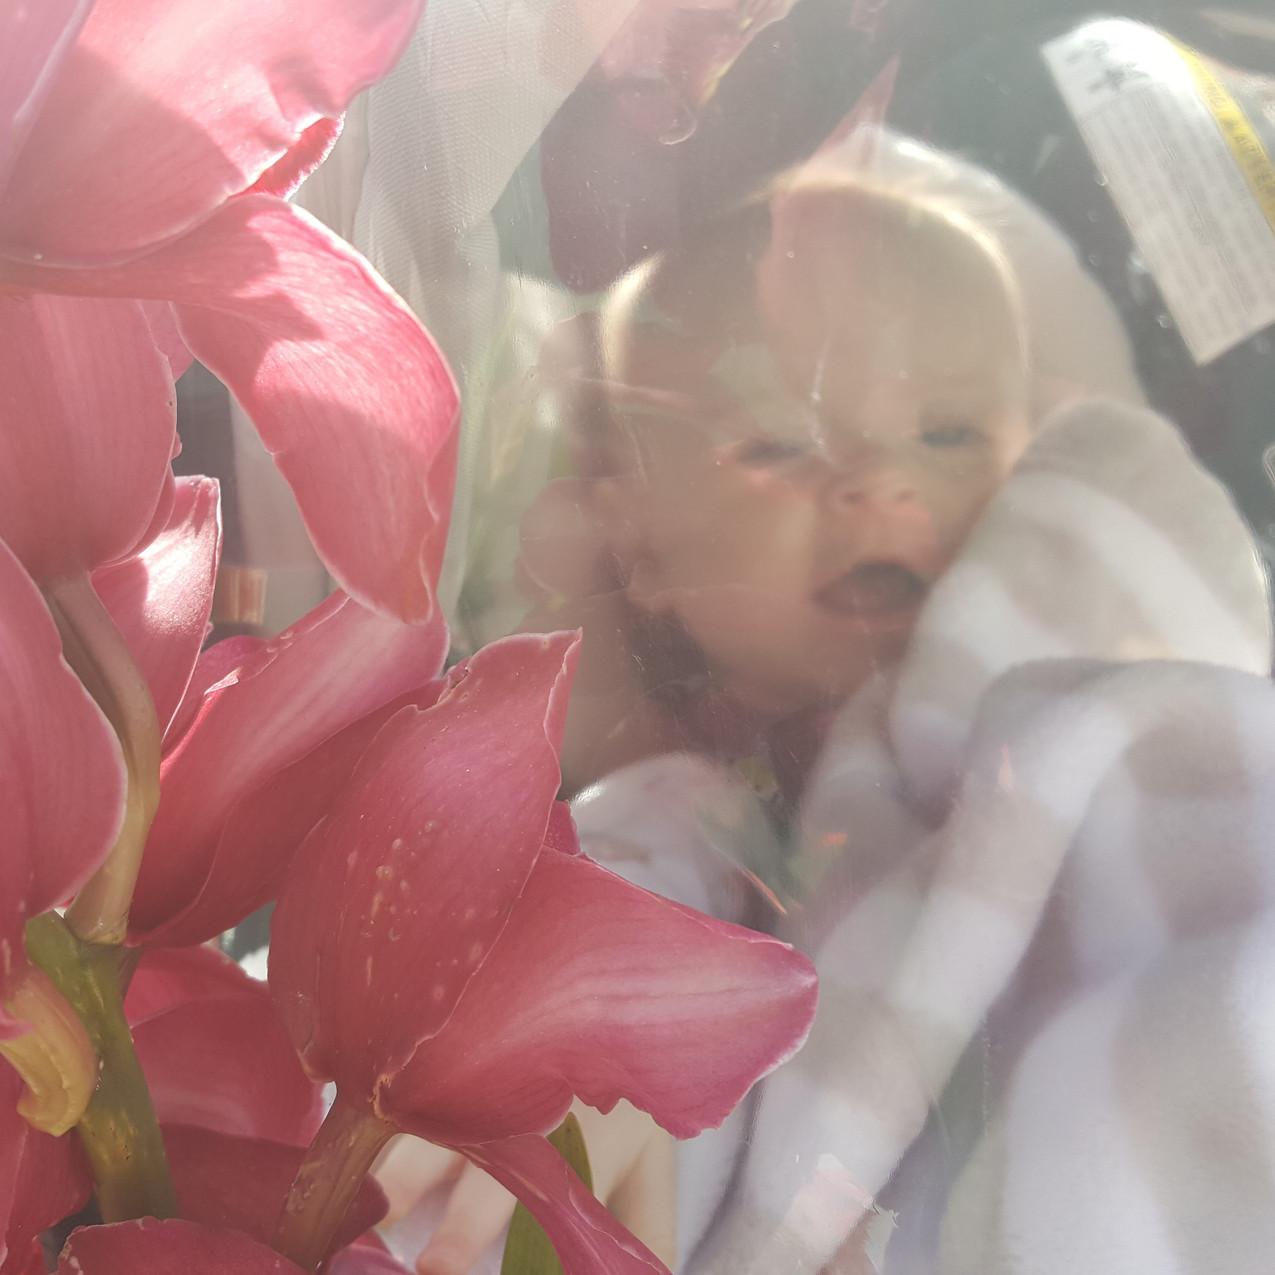 A-Floral-Affair-Flower-Box-Baby (1)